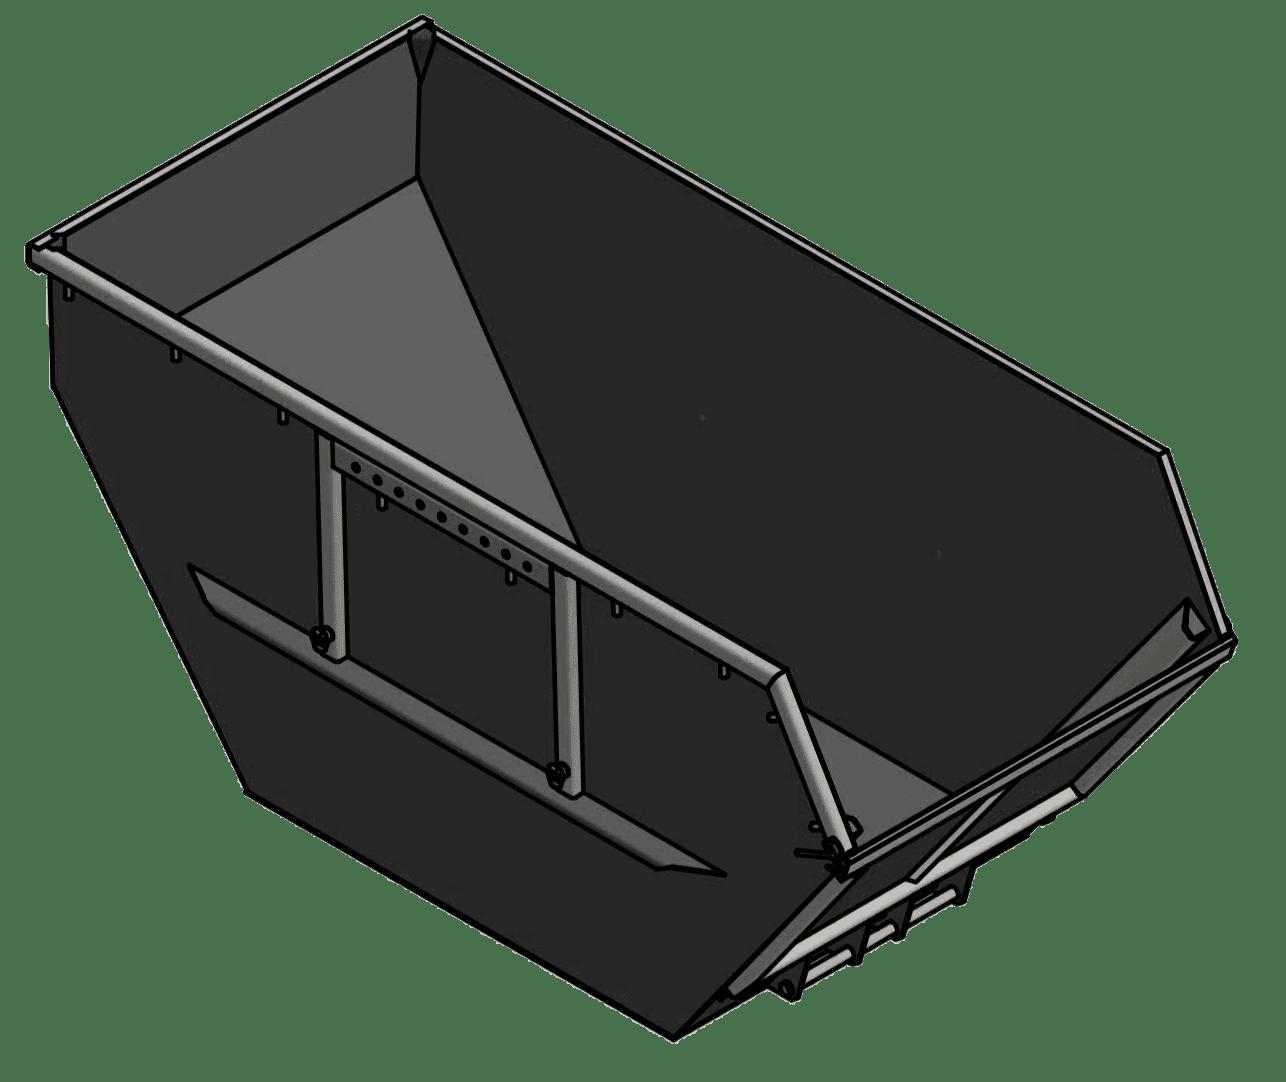 absetzcontainer nach din 30720 1 3 fach kipplager neue. Black Bedroom Furniture Sets. Home Design Ideas